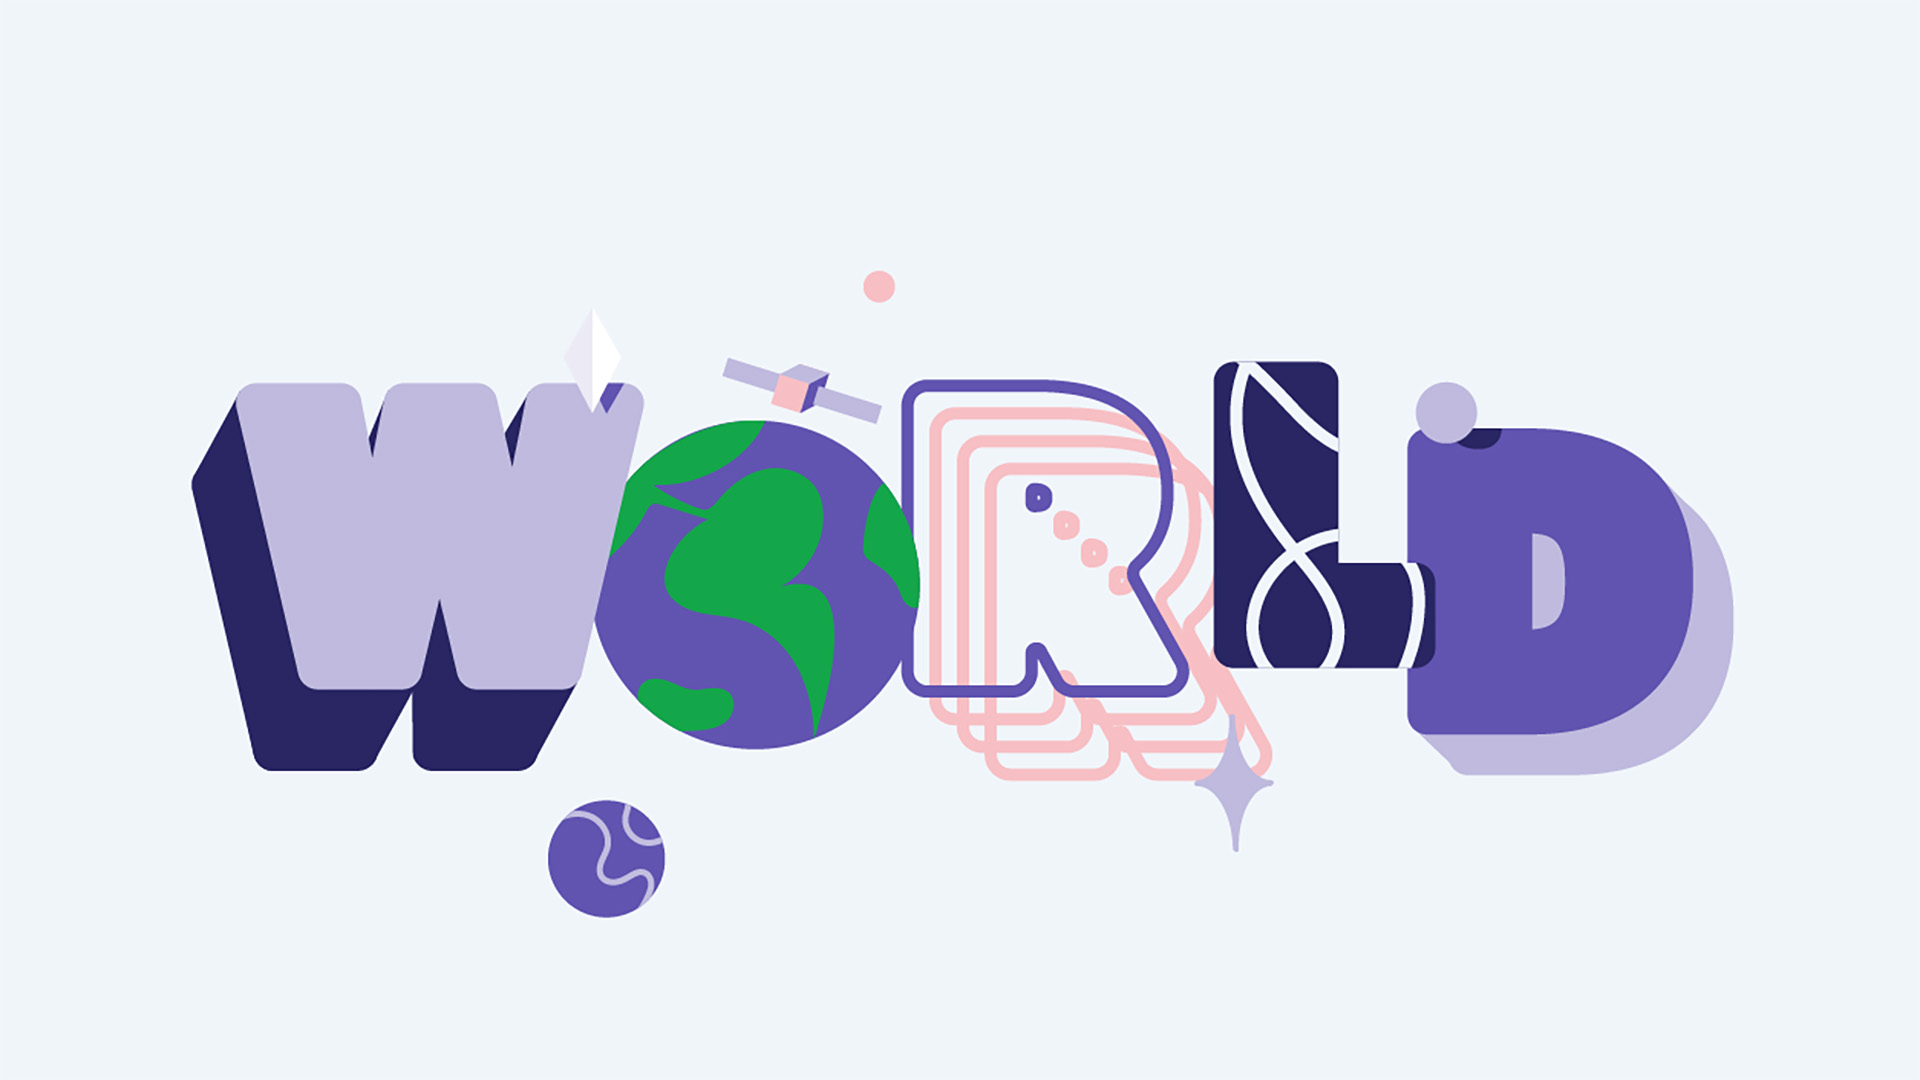 roofstudio_juni-learning_world-02-3